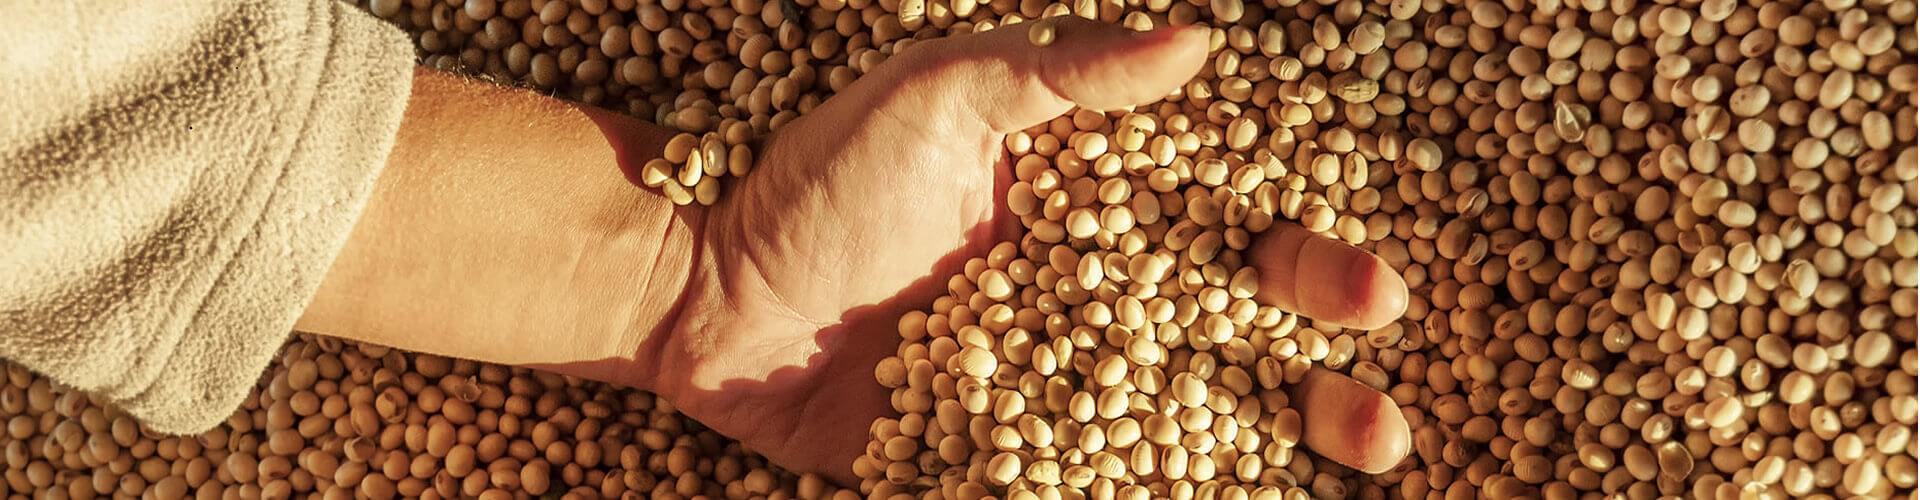 Alimentos Naturais para Empórios e Supermercados